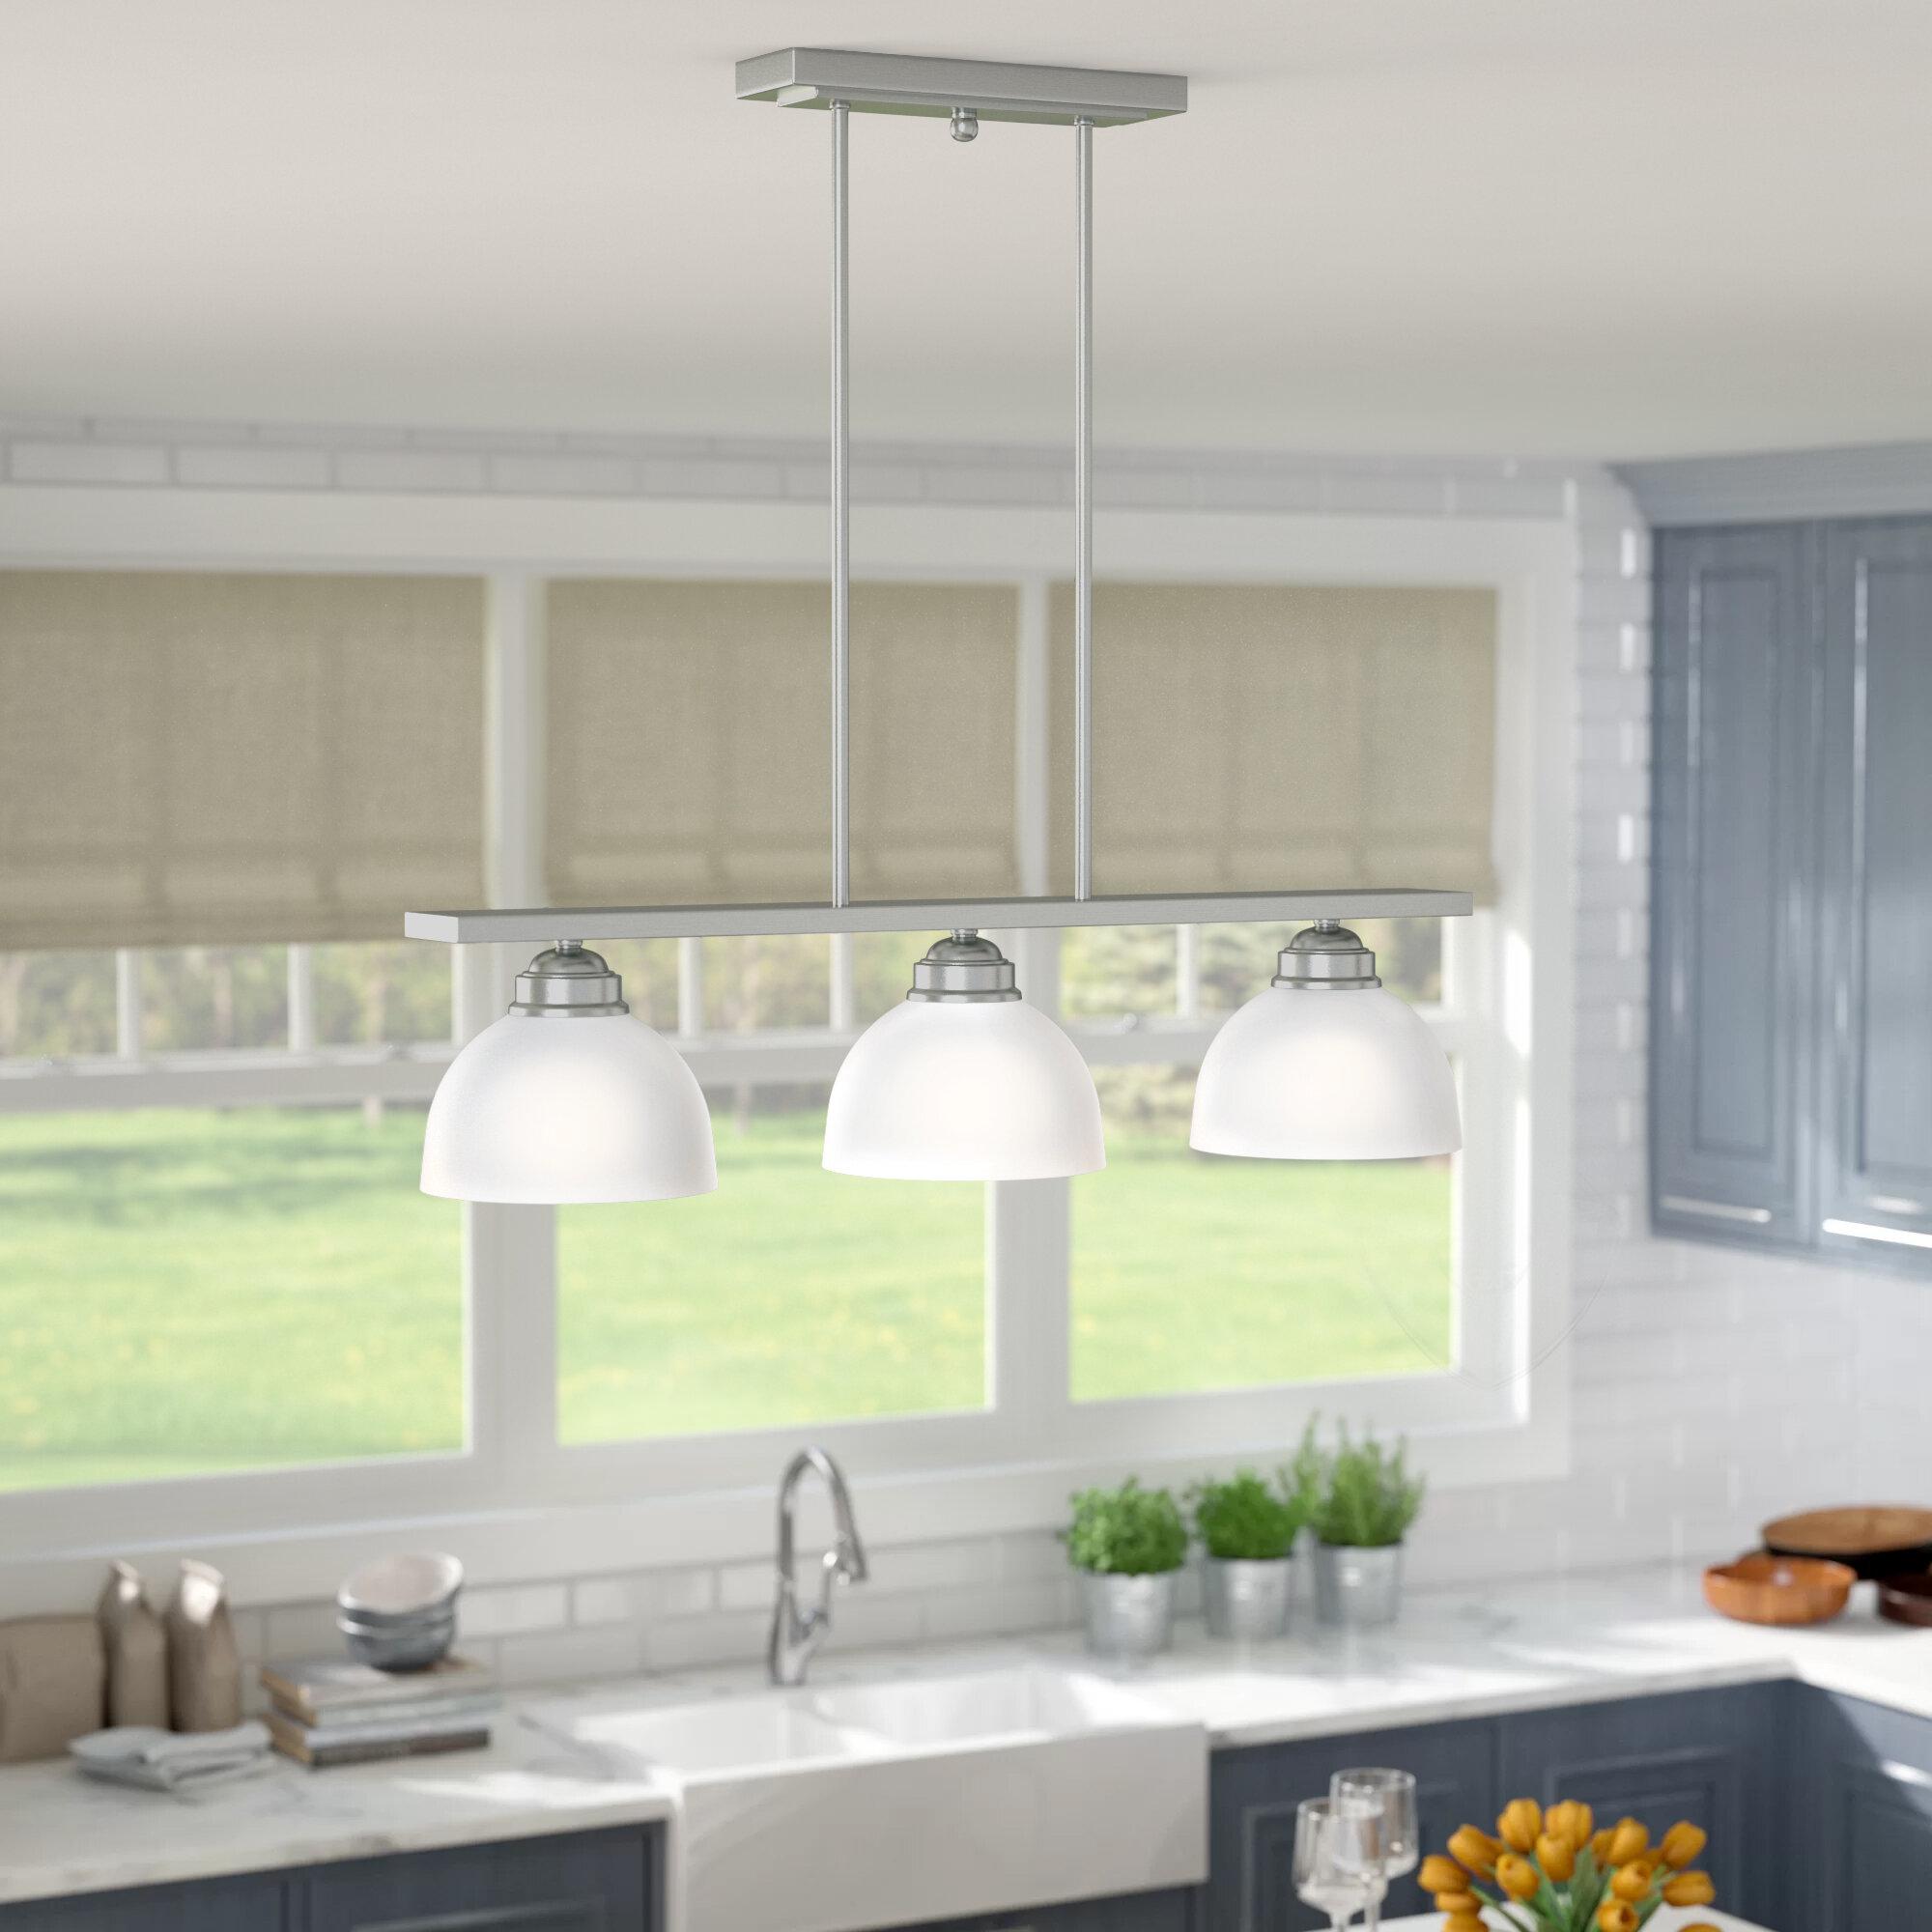 Brushed Nickel Kitchen Island Pendant Lighting You Ll Love In 2020 Wayfair